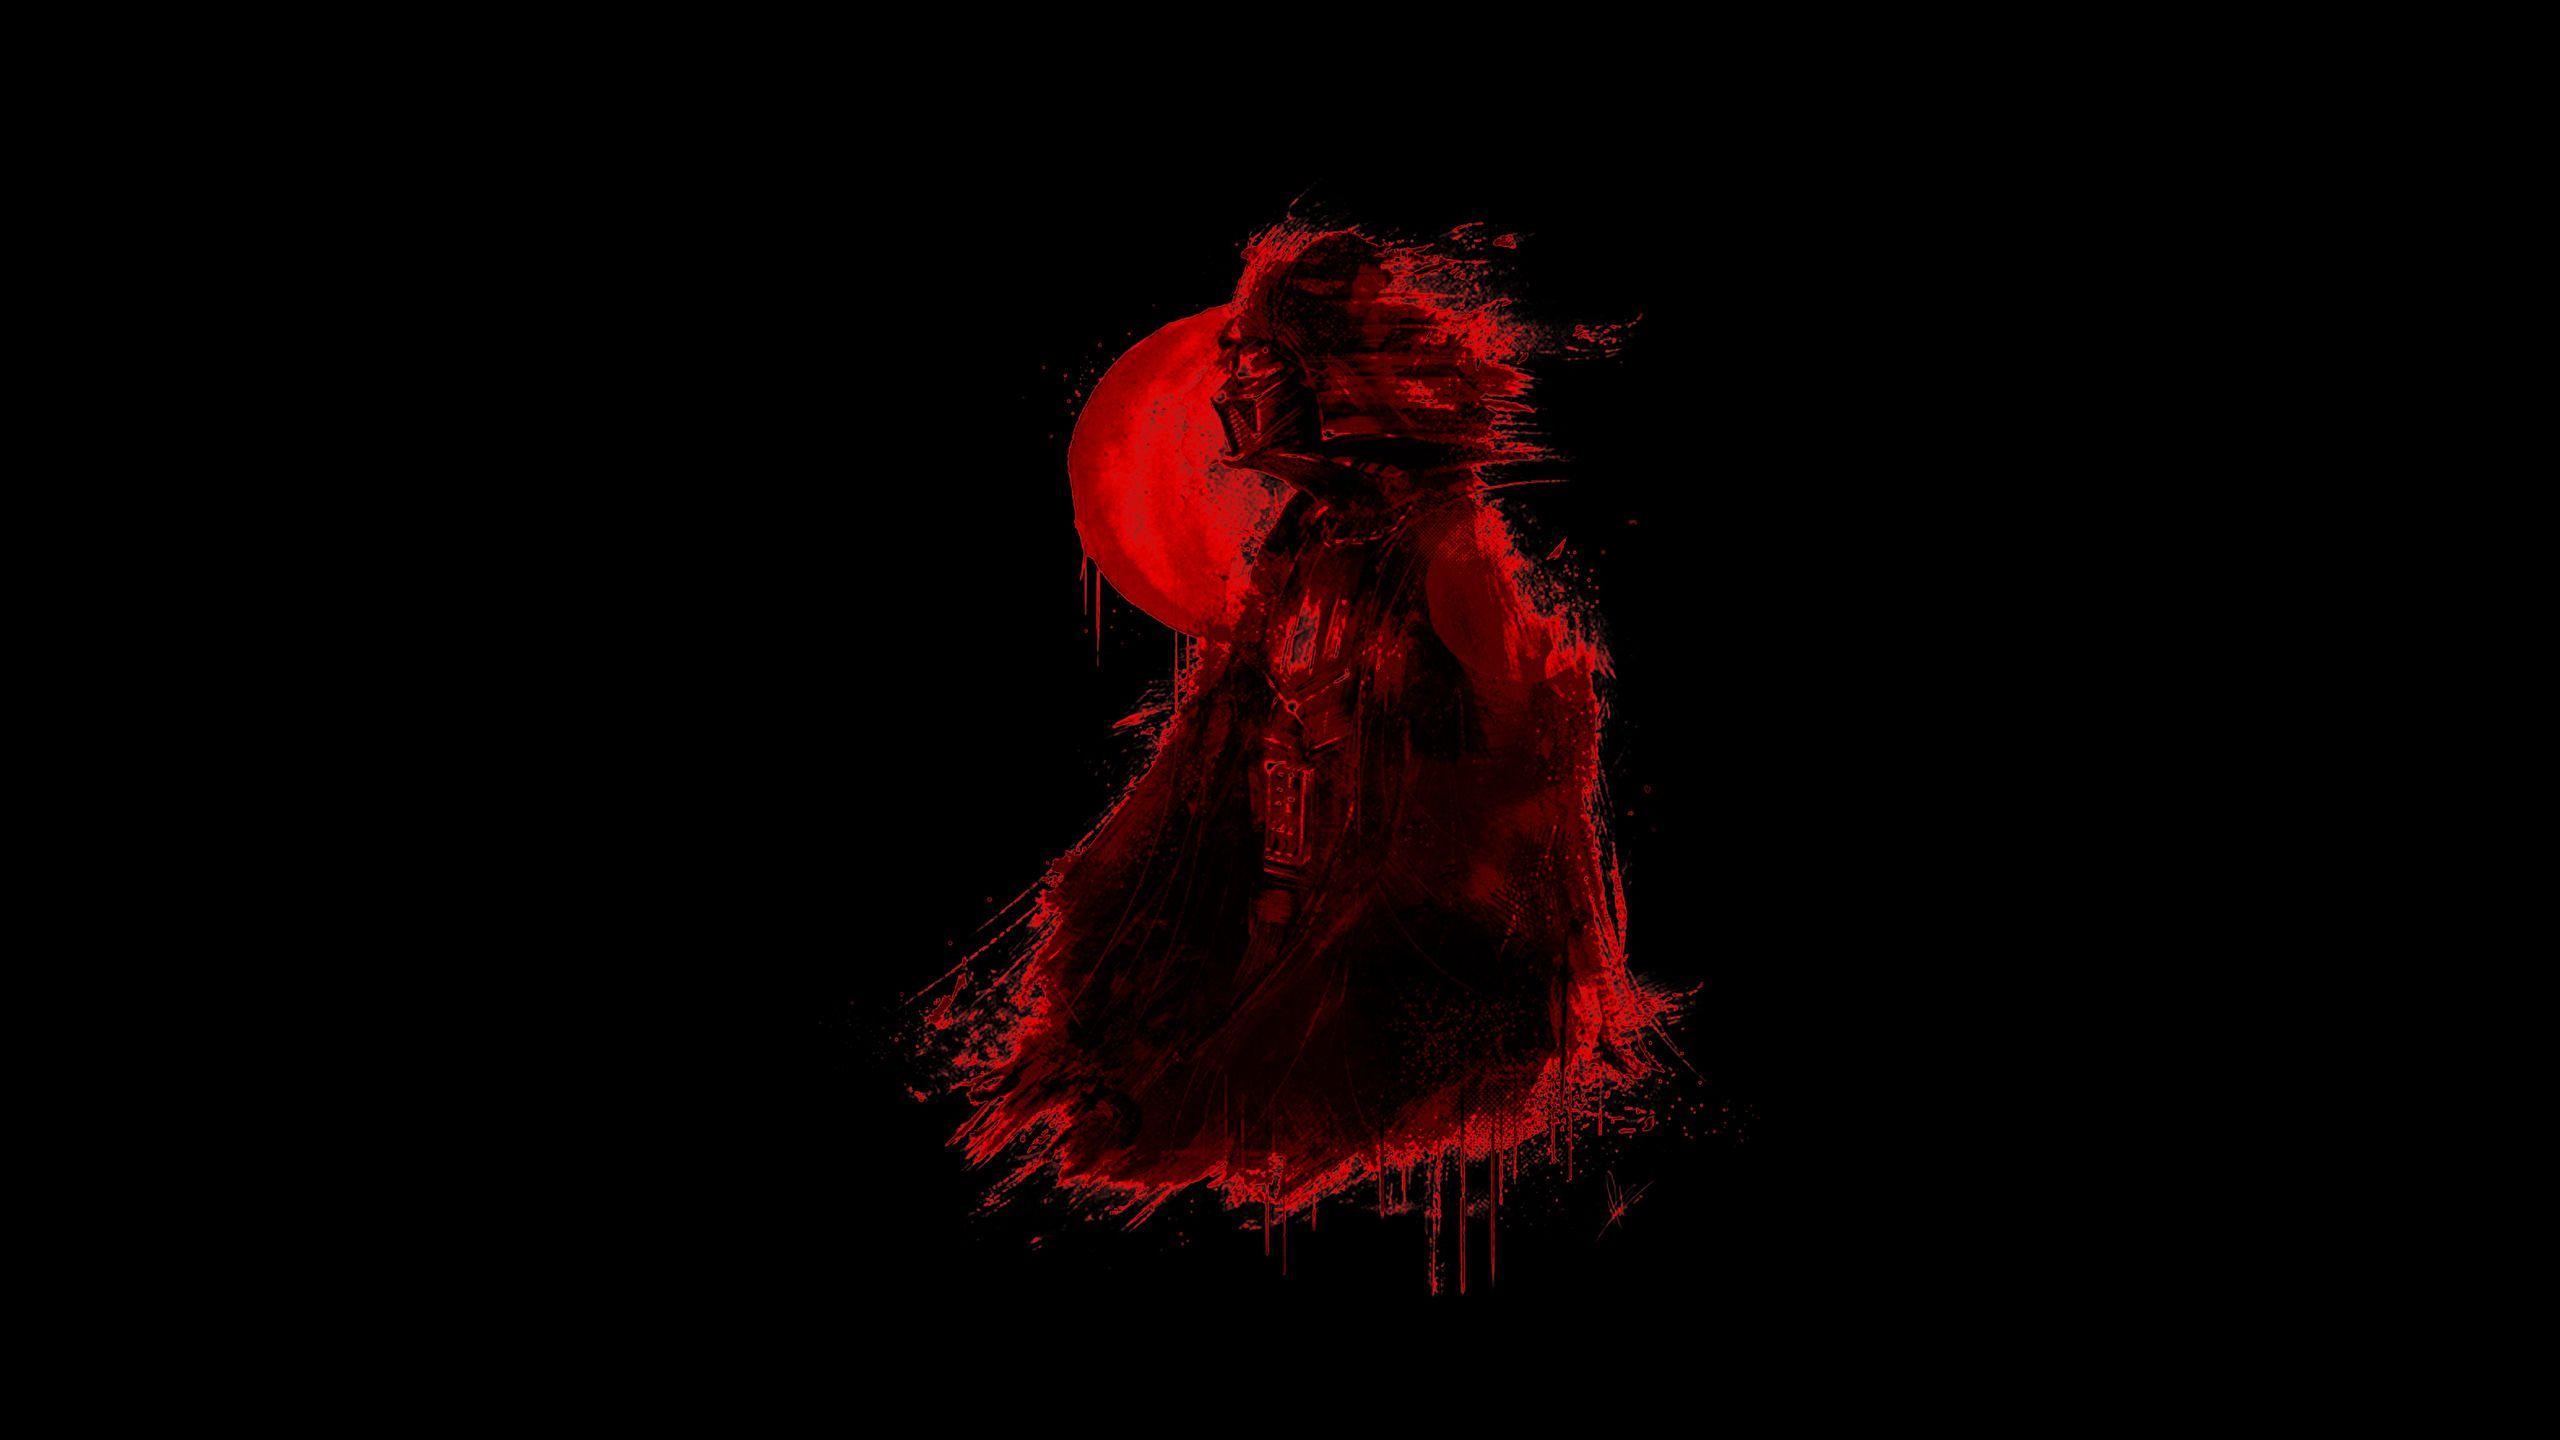 Stylized Red Vader For Black Amoled Screens 2560 1440 Jpg 2560 1440 Dark Background Wallpaper Joker Iphone Wallpaper Samsung Wallpaper Android